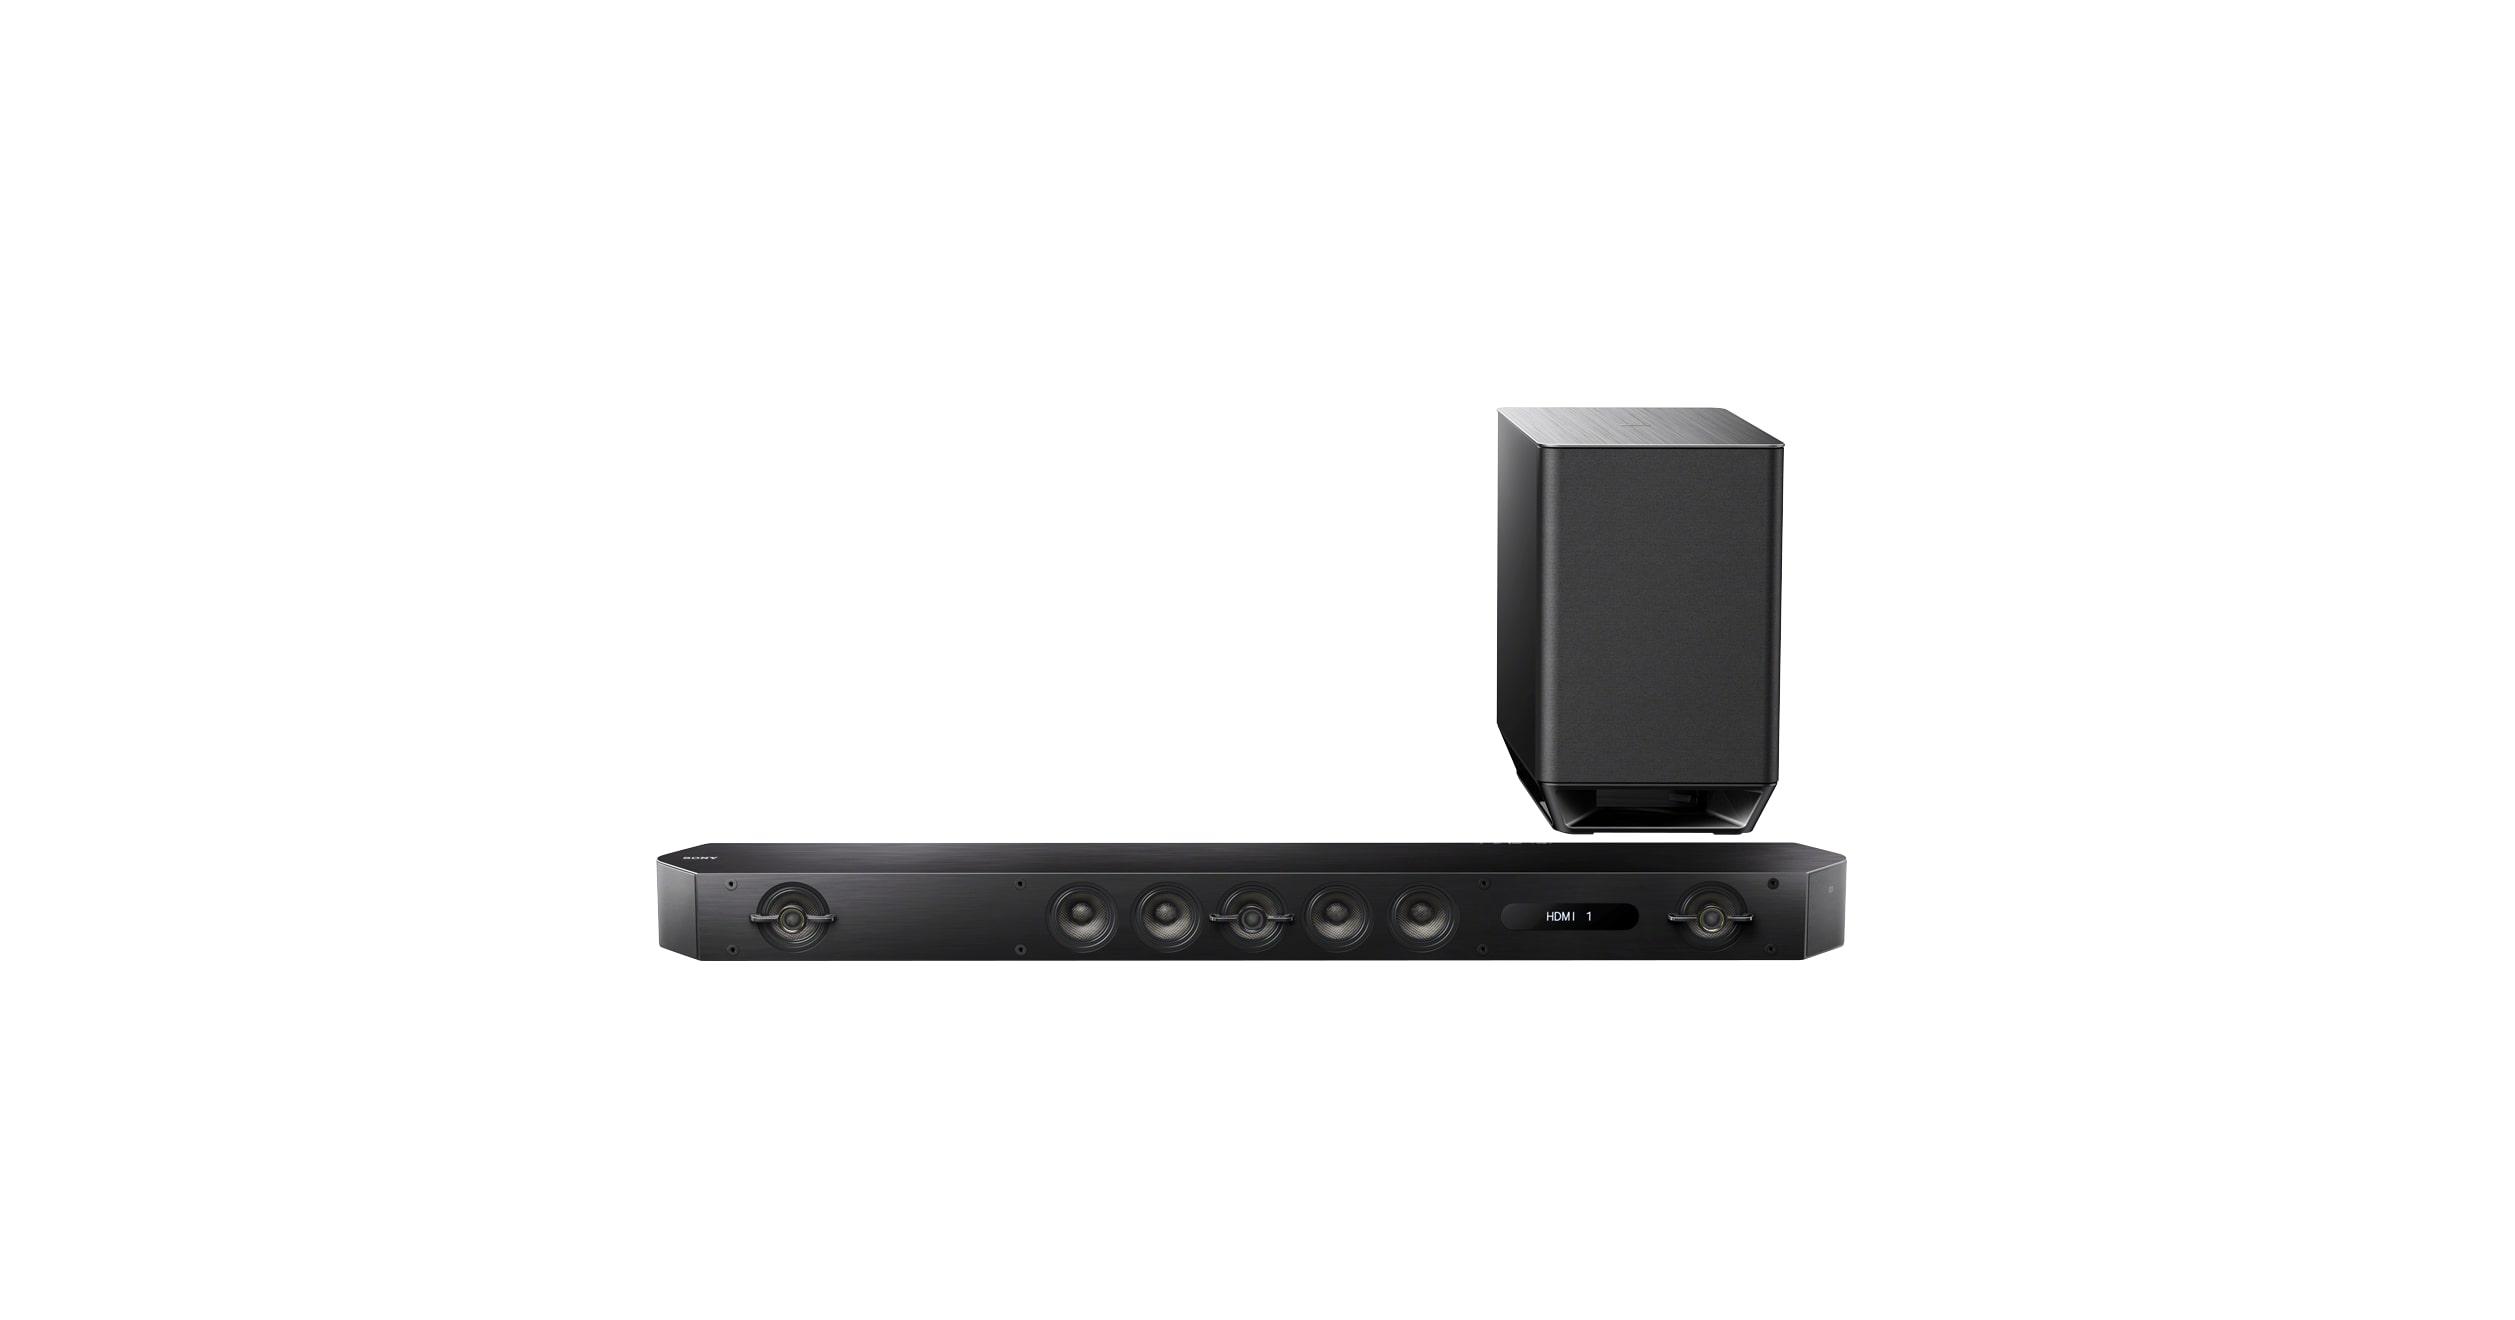 Bluetooth Sound Bar with HDMI & 7.1 ch Surround Sound | HT-ST9 | Sony US